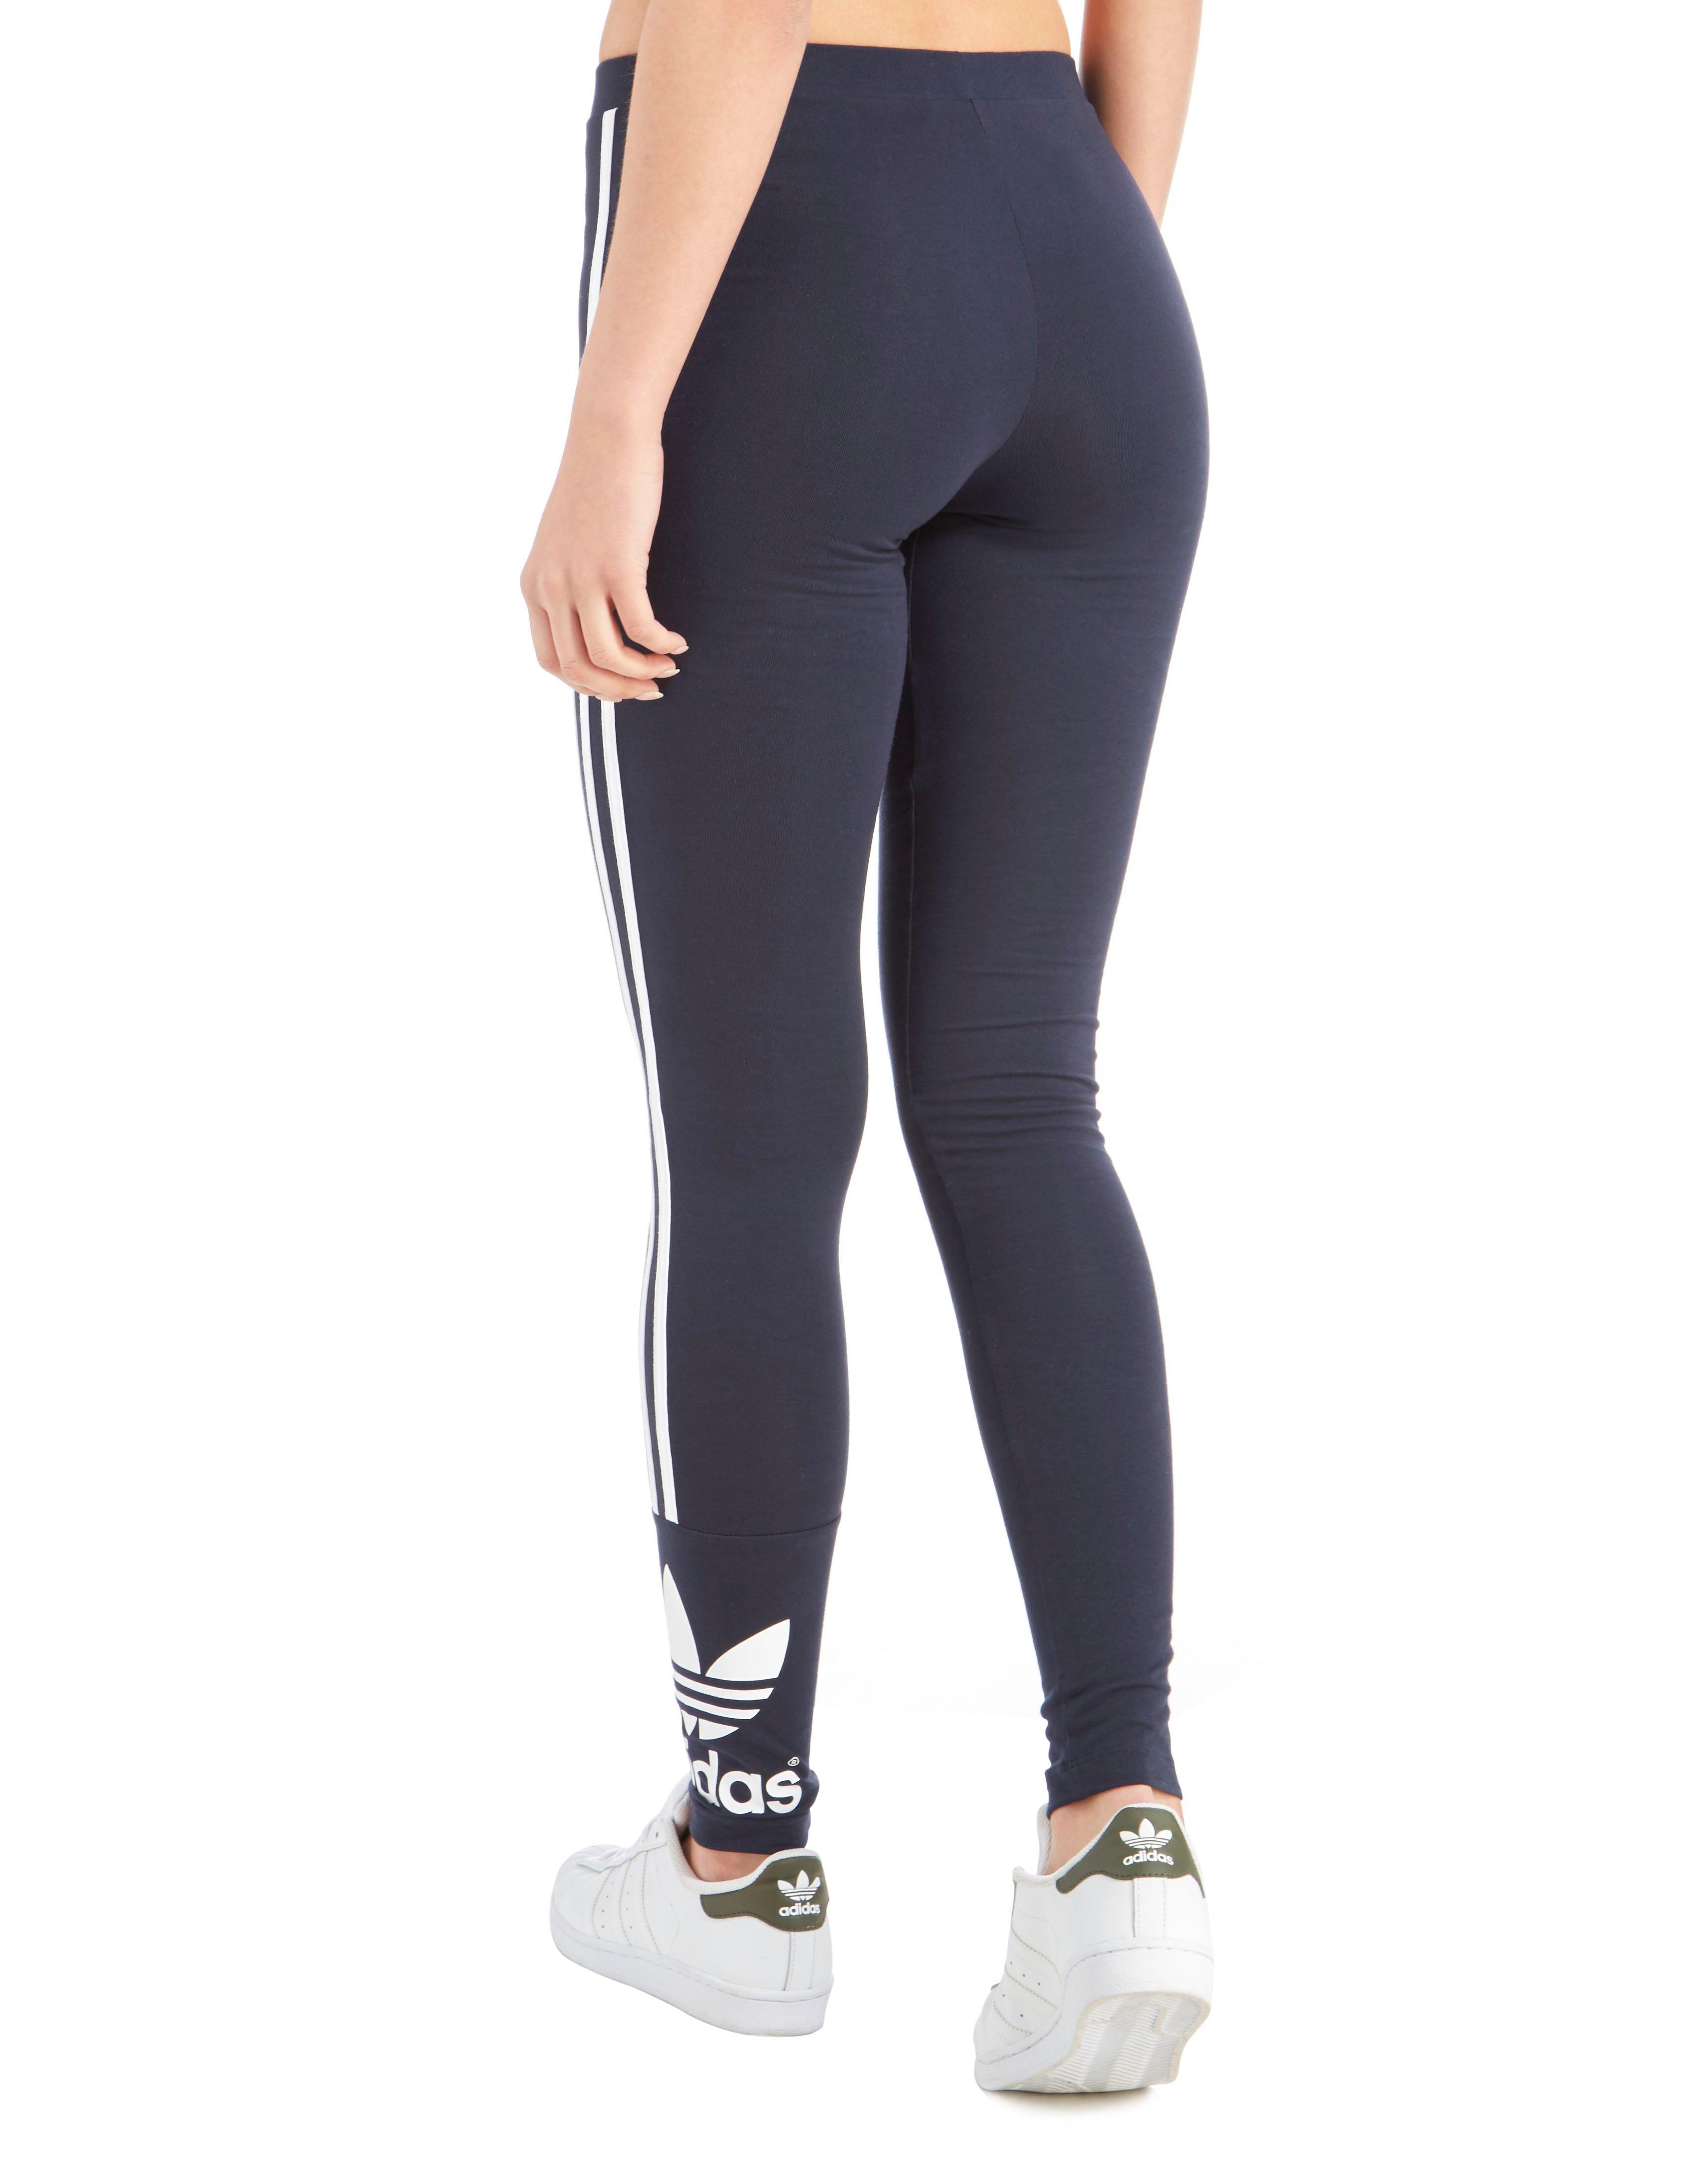 b5f3c74fc82a99 adidas Originals 3 Stripe Trefoil Leggings in Blue - Lyst